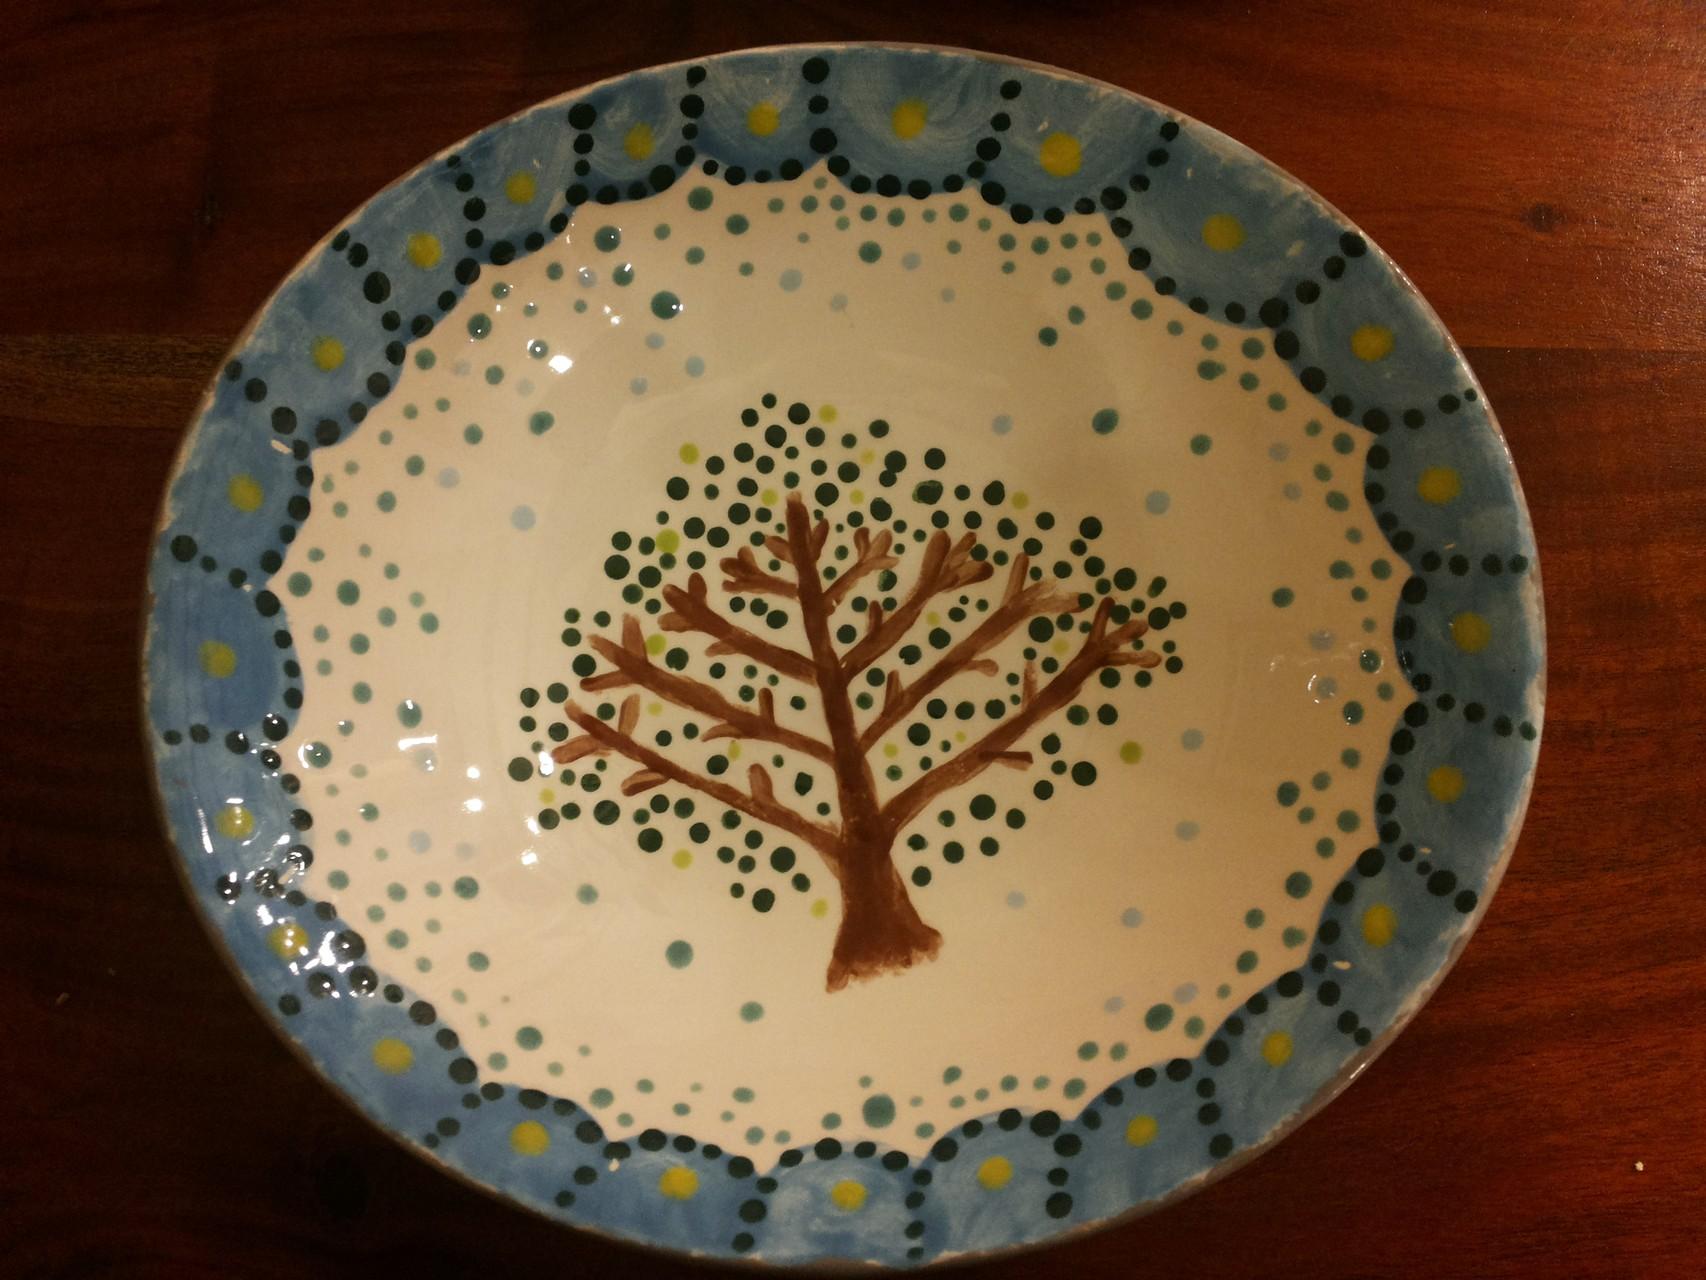 blog keramik malerei bei artcuisine. Black Bedroom Furniture Sets. Home Design Ideas